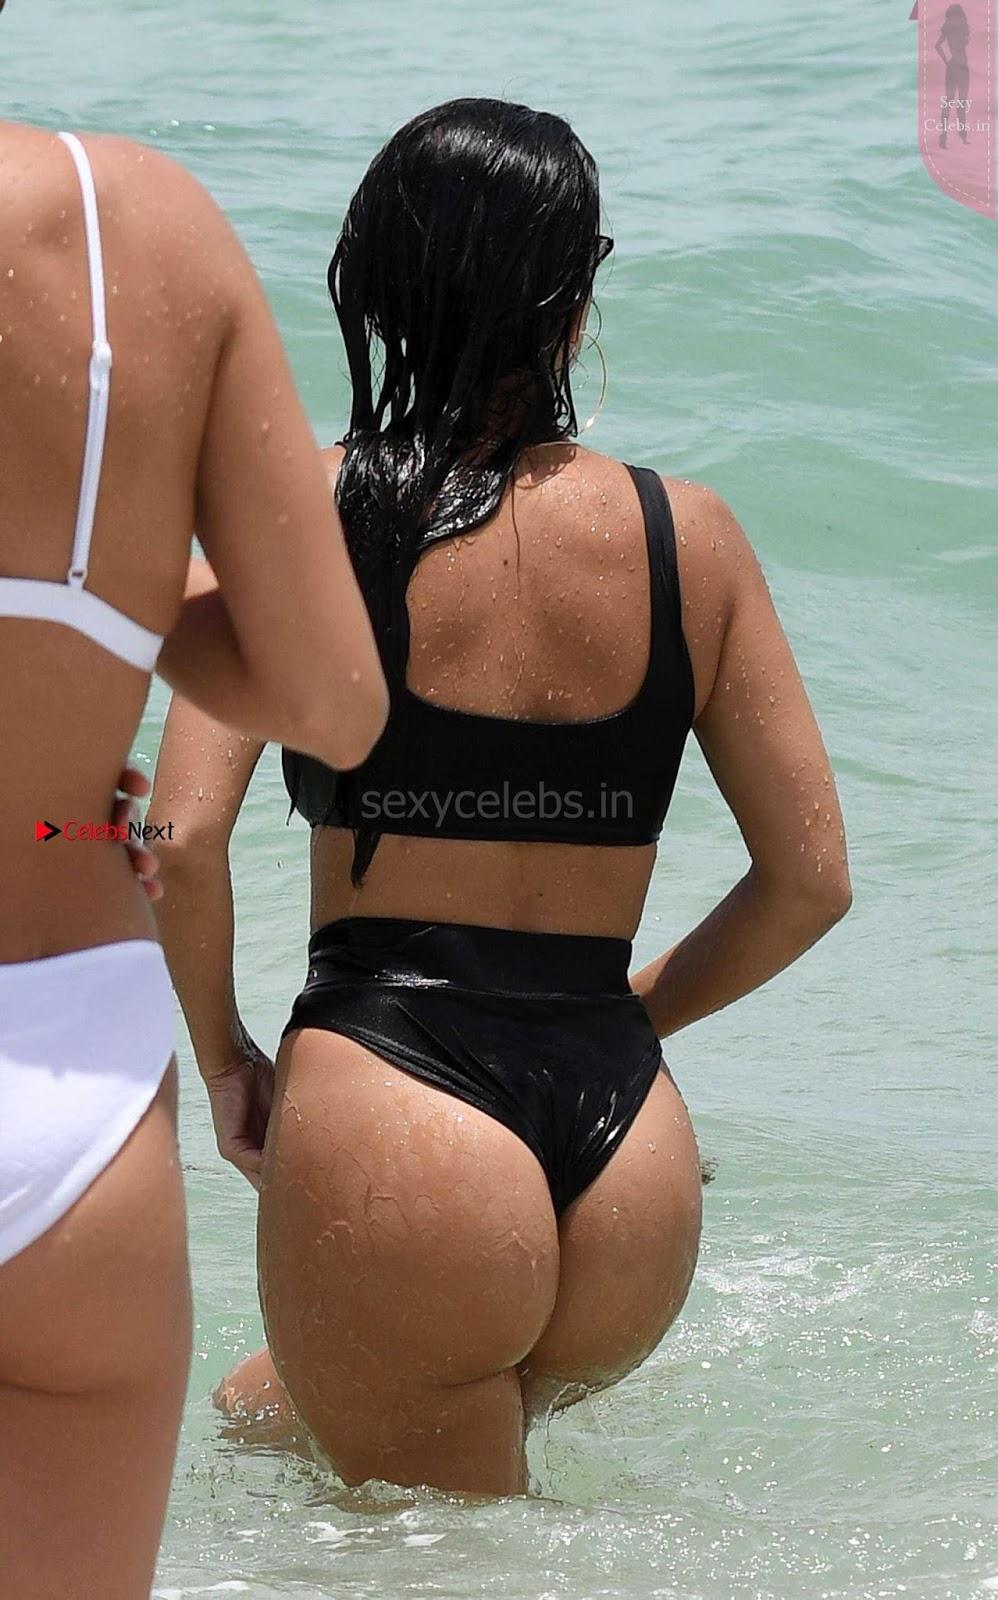 Kourtney Kardashian proud owner of Most beautiful Ass in Black Bikini and White Bikini in Miami